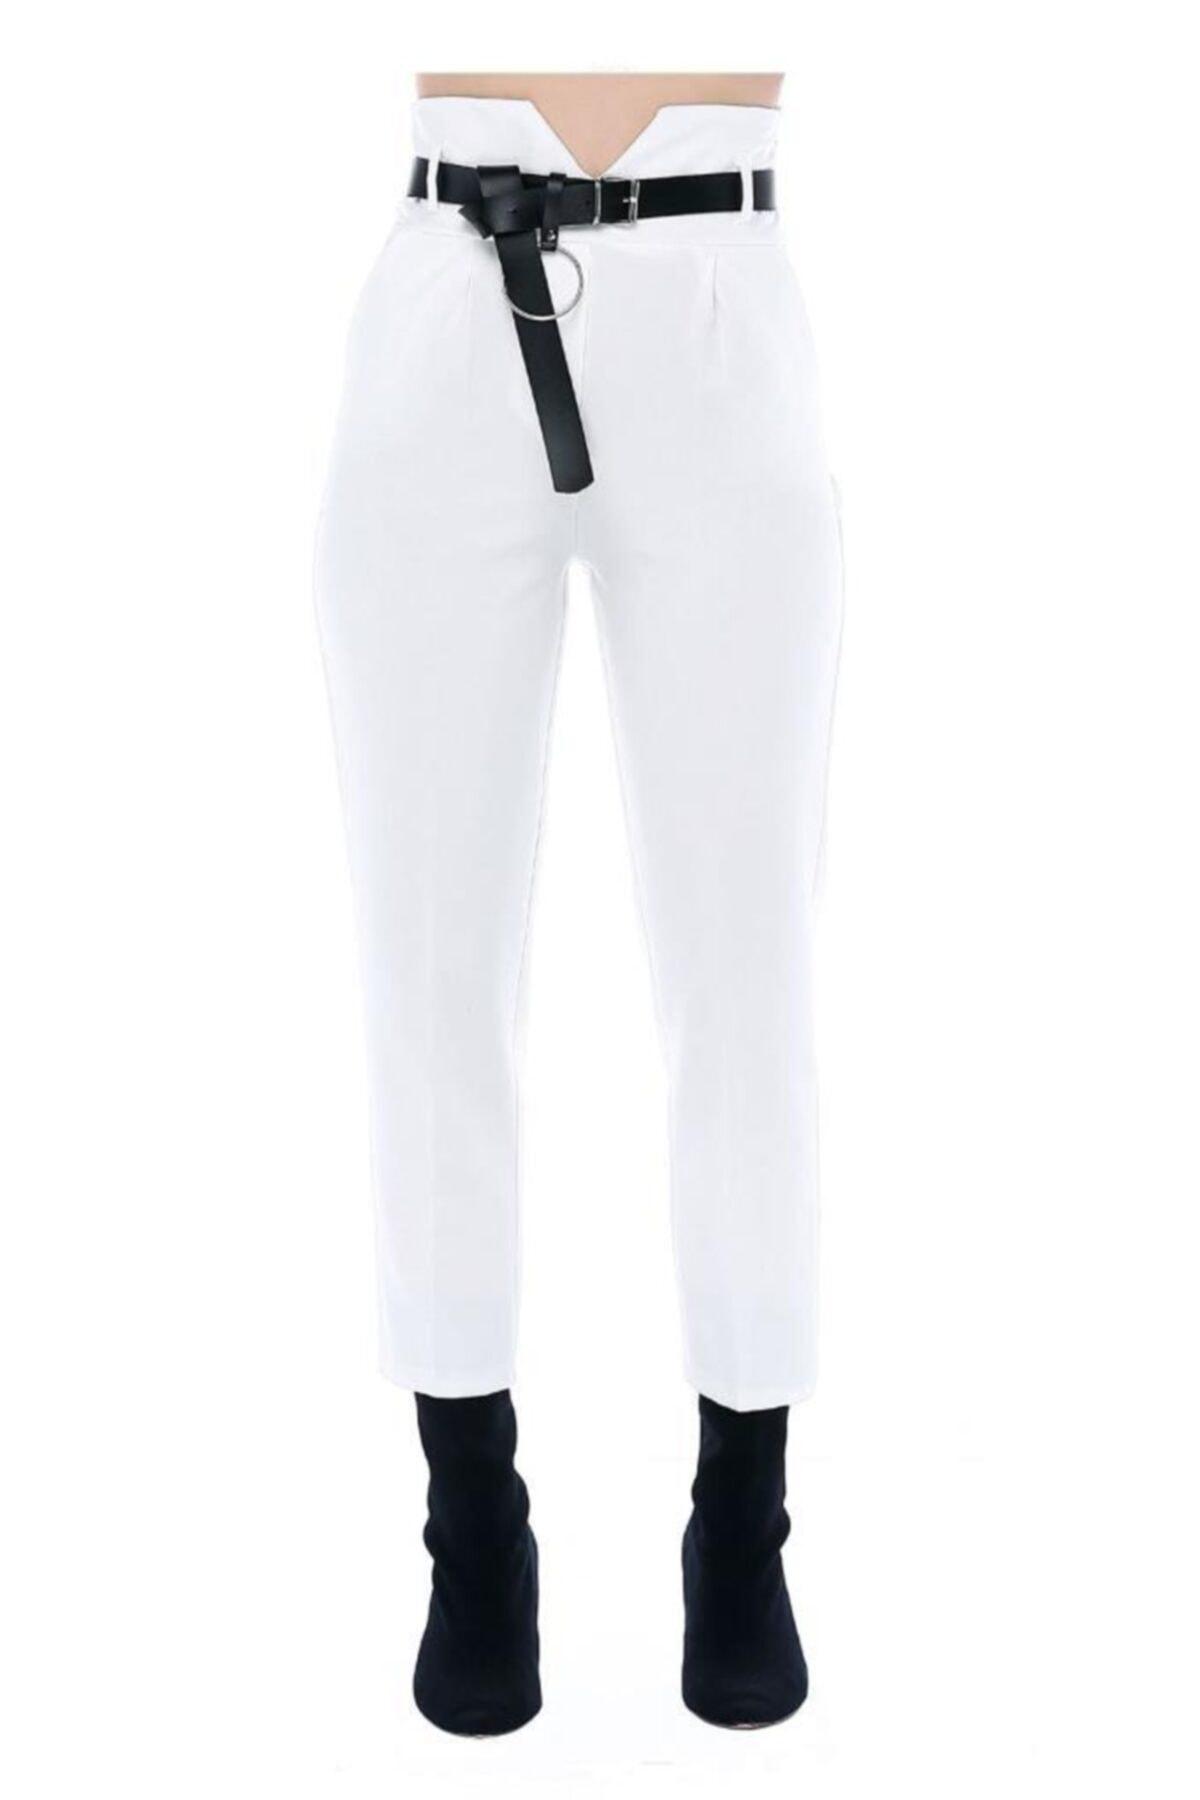 Modkofoni Yüksek Bel Deri Kemerli Beyaz Bilek Pantolon 2